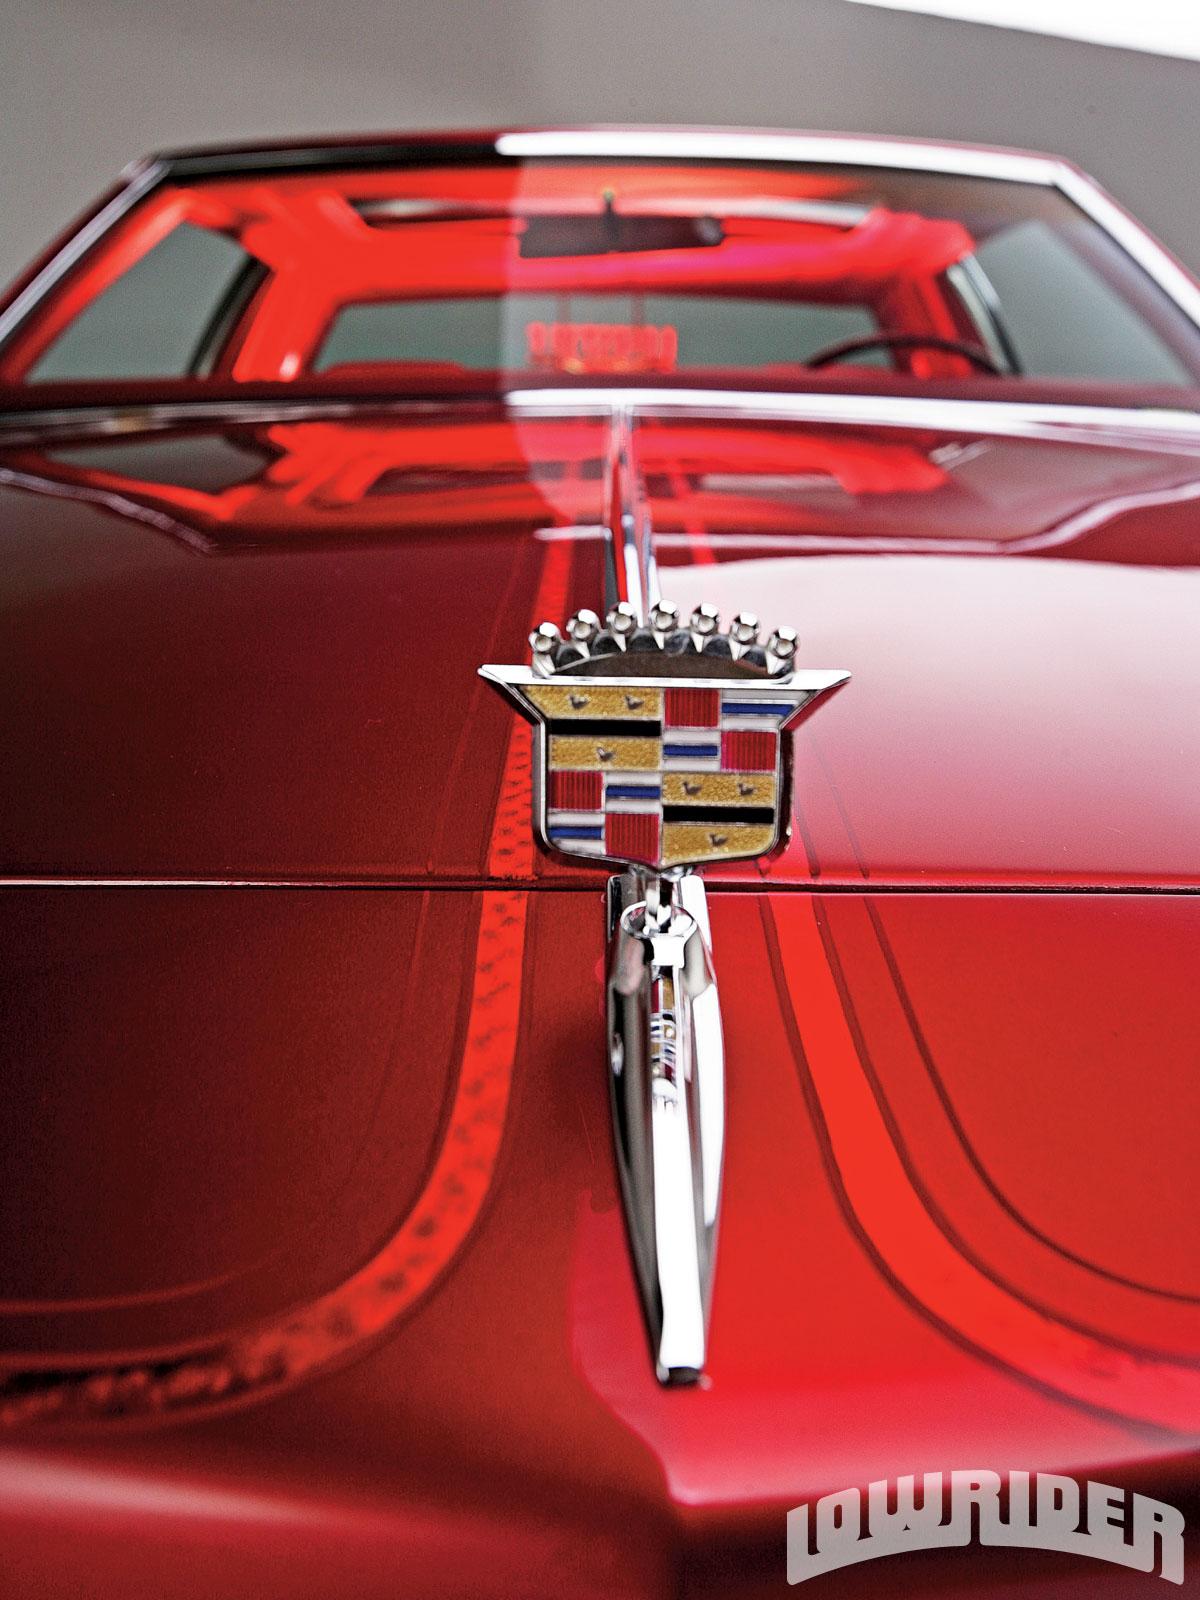 1984 Cadillac Coupe Deville